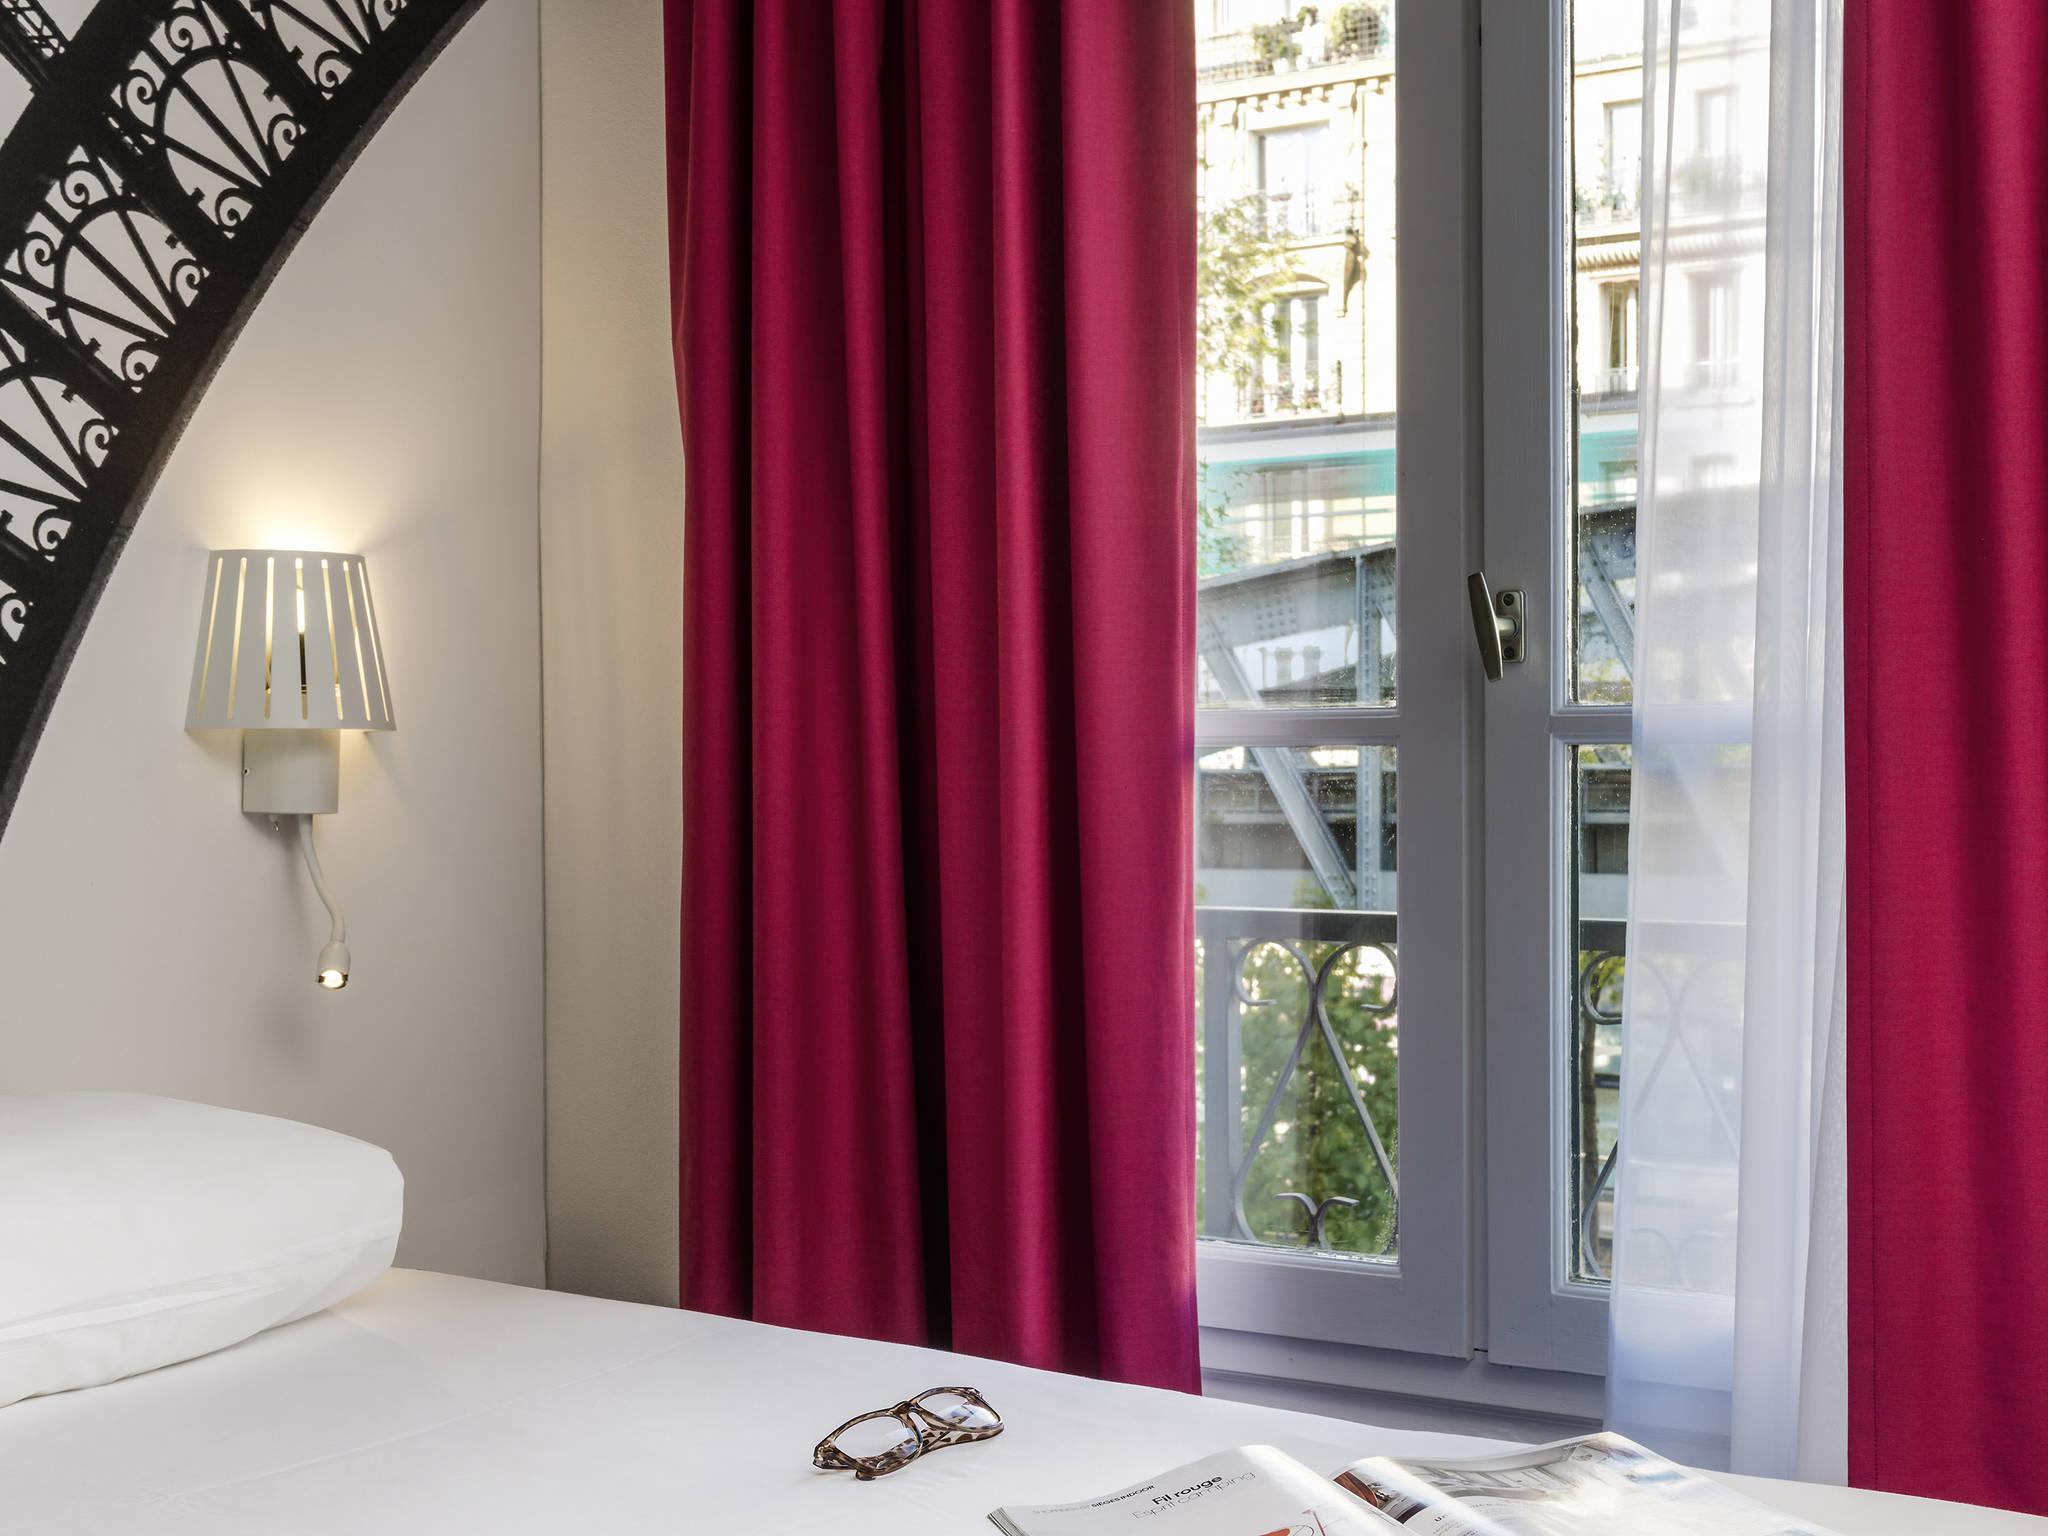 Hotell – ibis Styles Paris Eiffel Cambronne